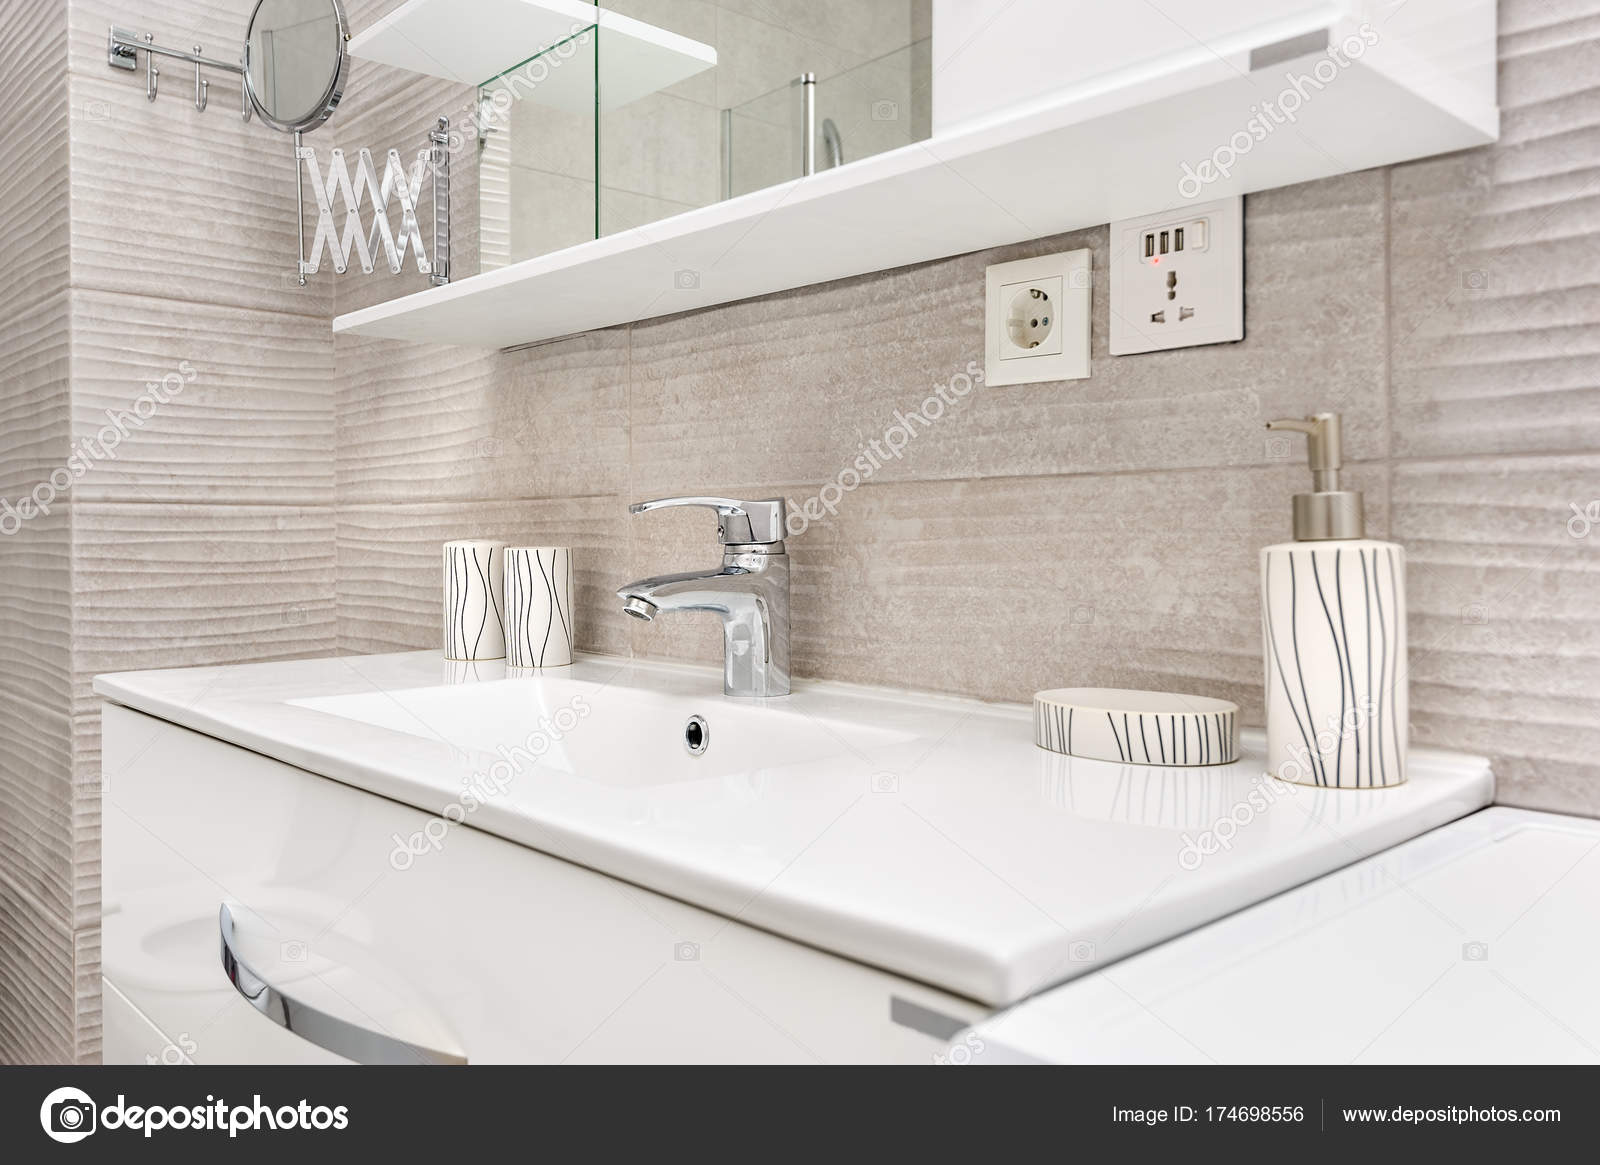 Badkamer Gootsteen Kast : Zinken in moderne badkamer u2014 stockfoto © starush #174698556